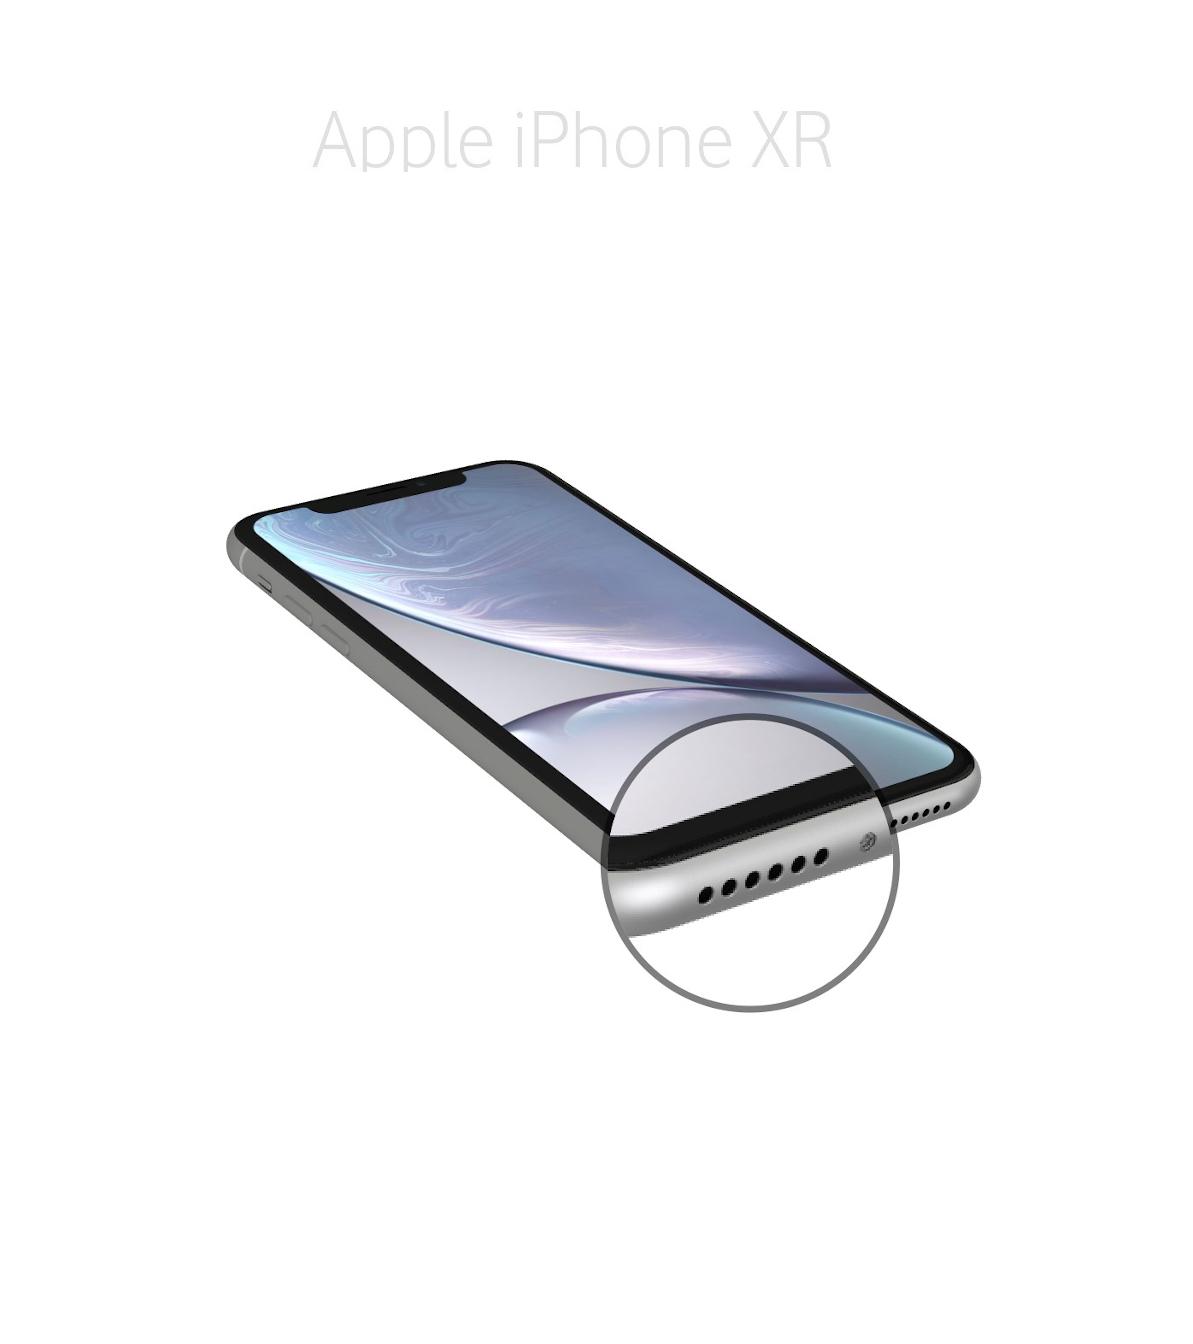 Laga samtalsmikrofon iPhone XR